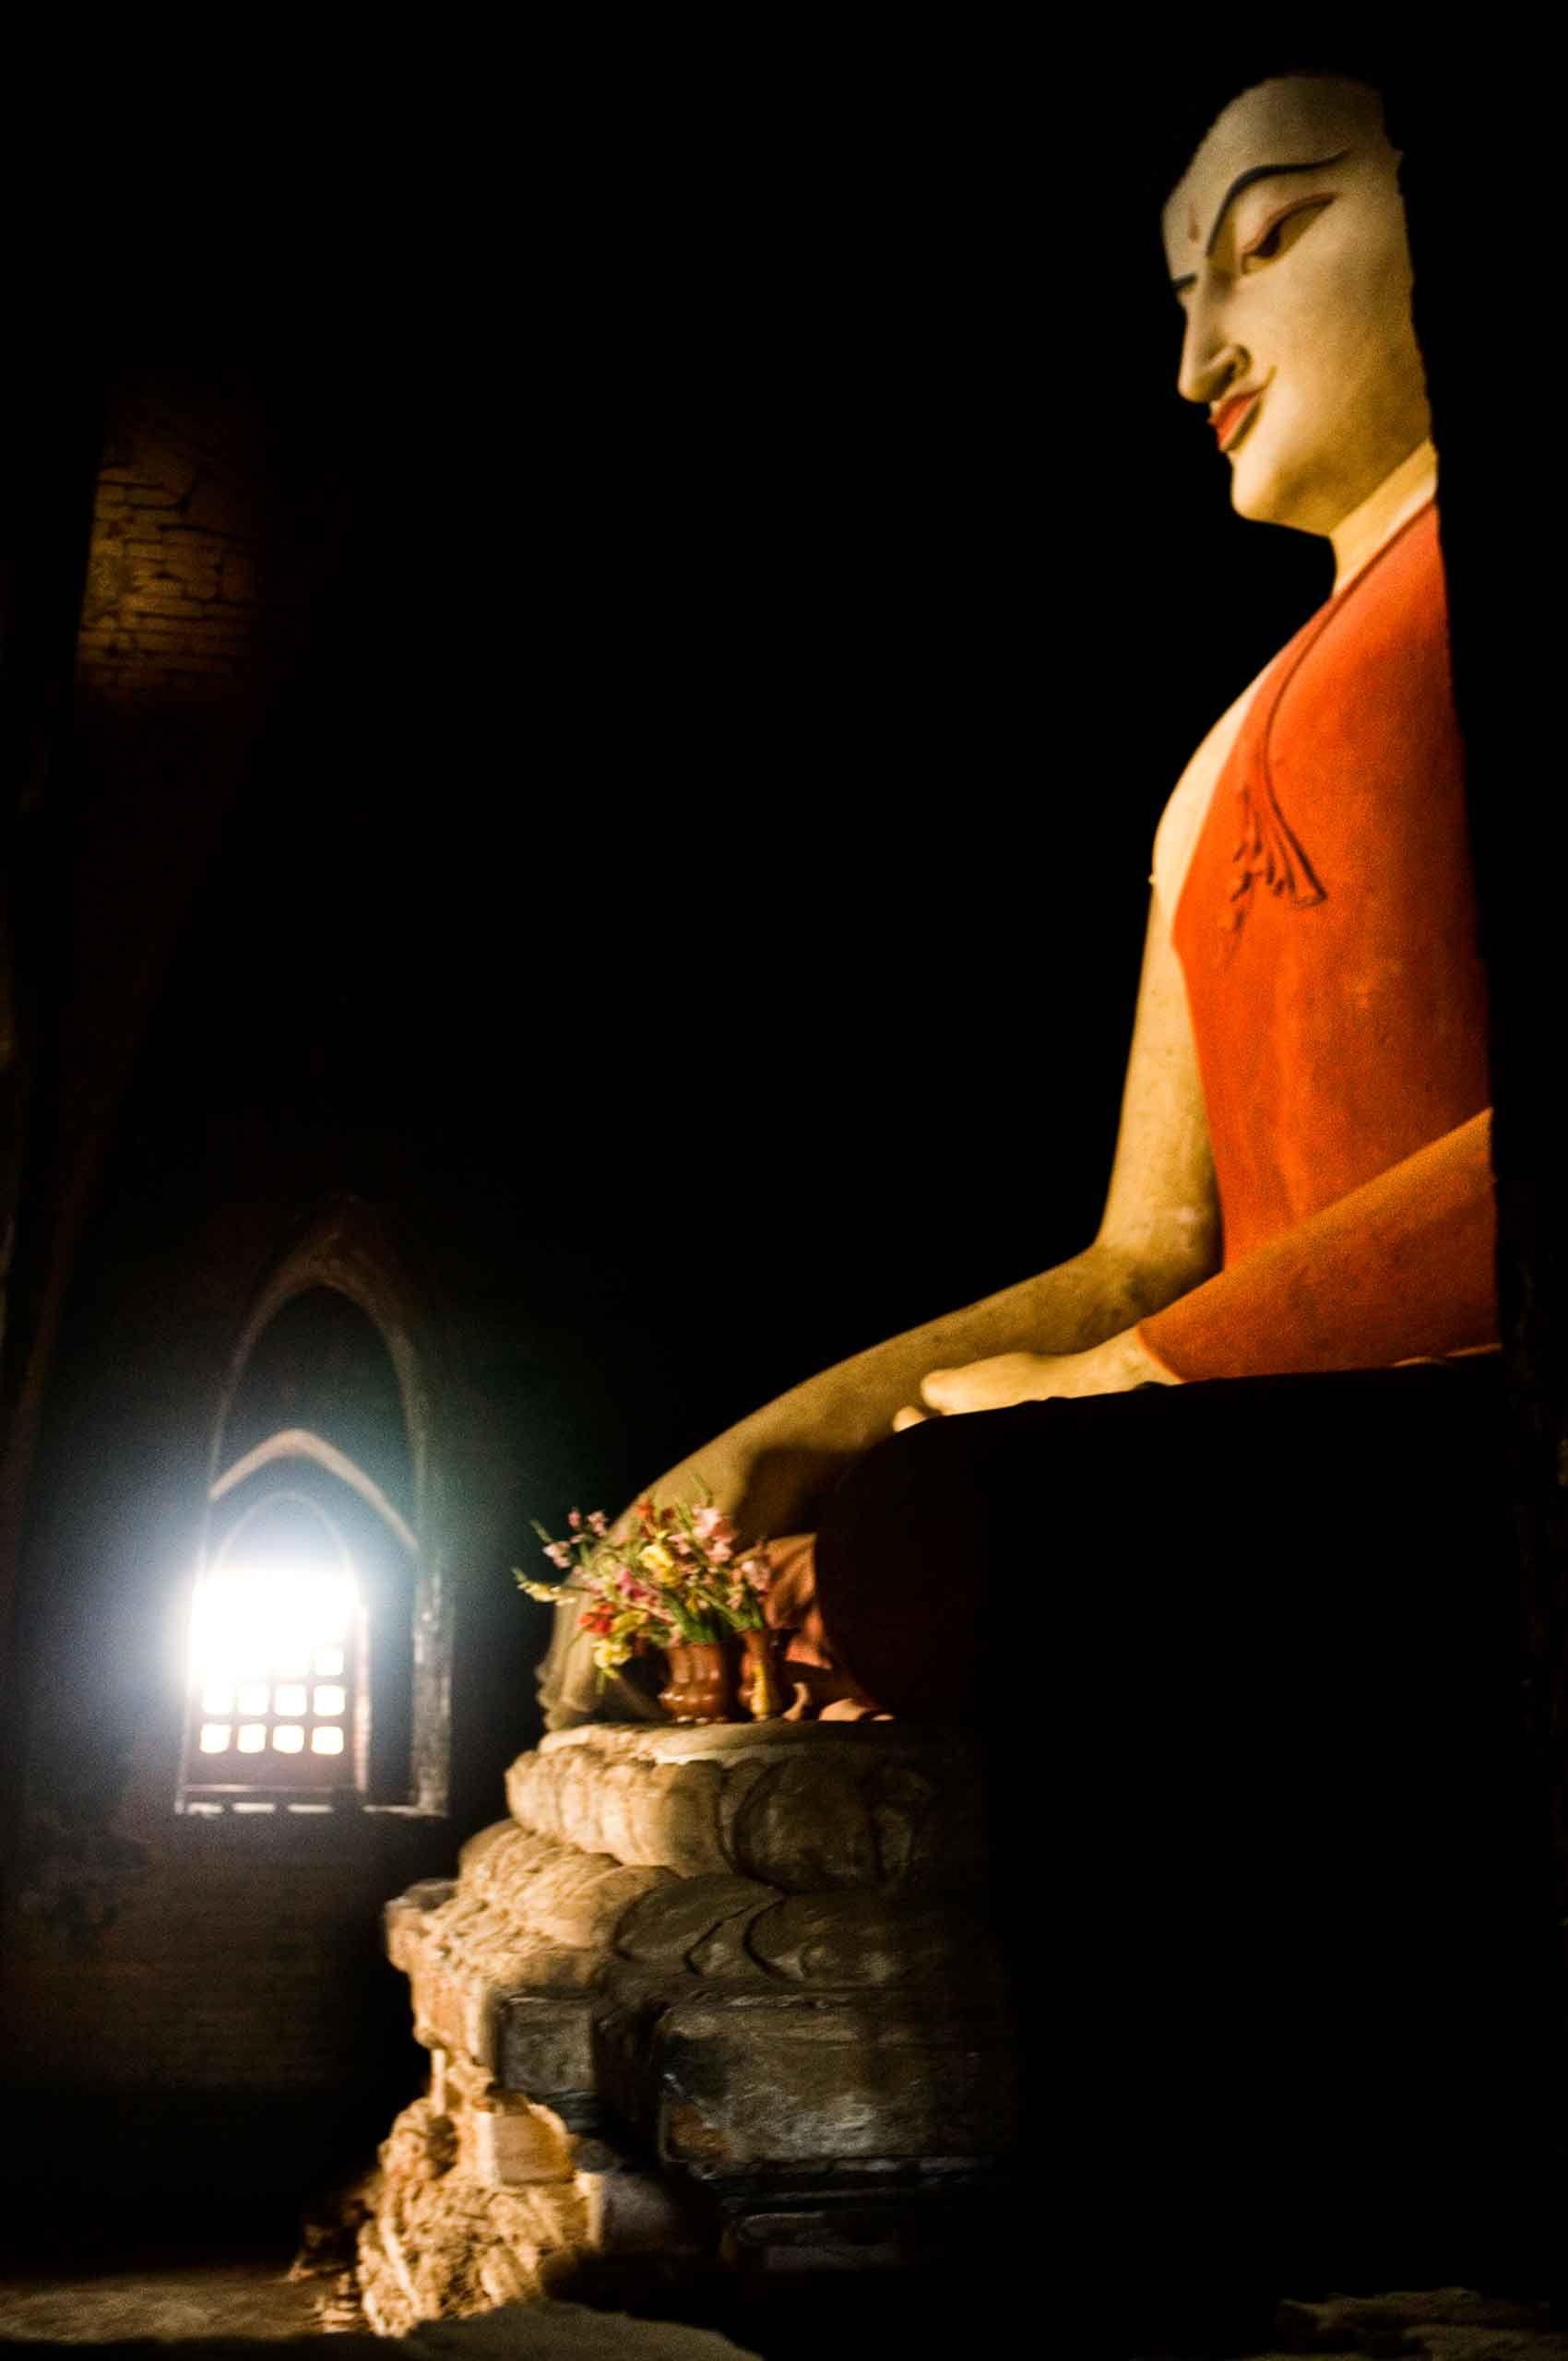 buddha-myanmar-by-henrikolundphotography.jpg